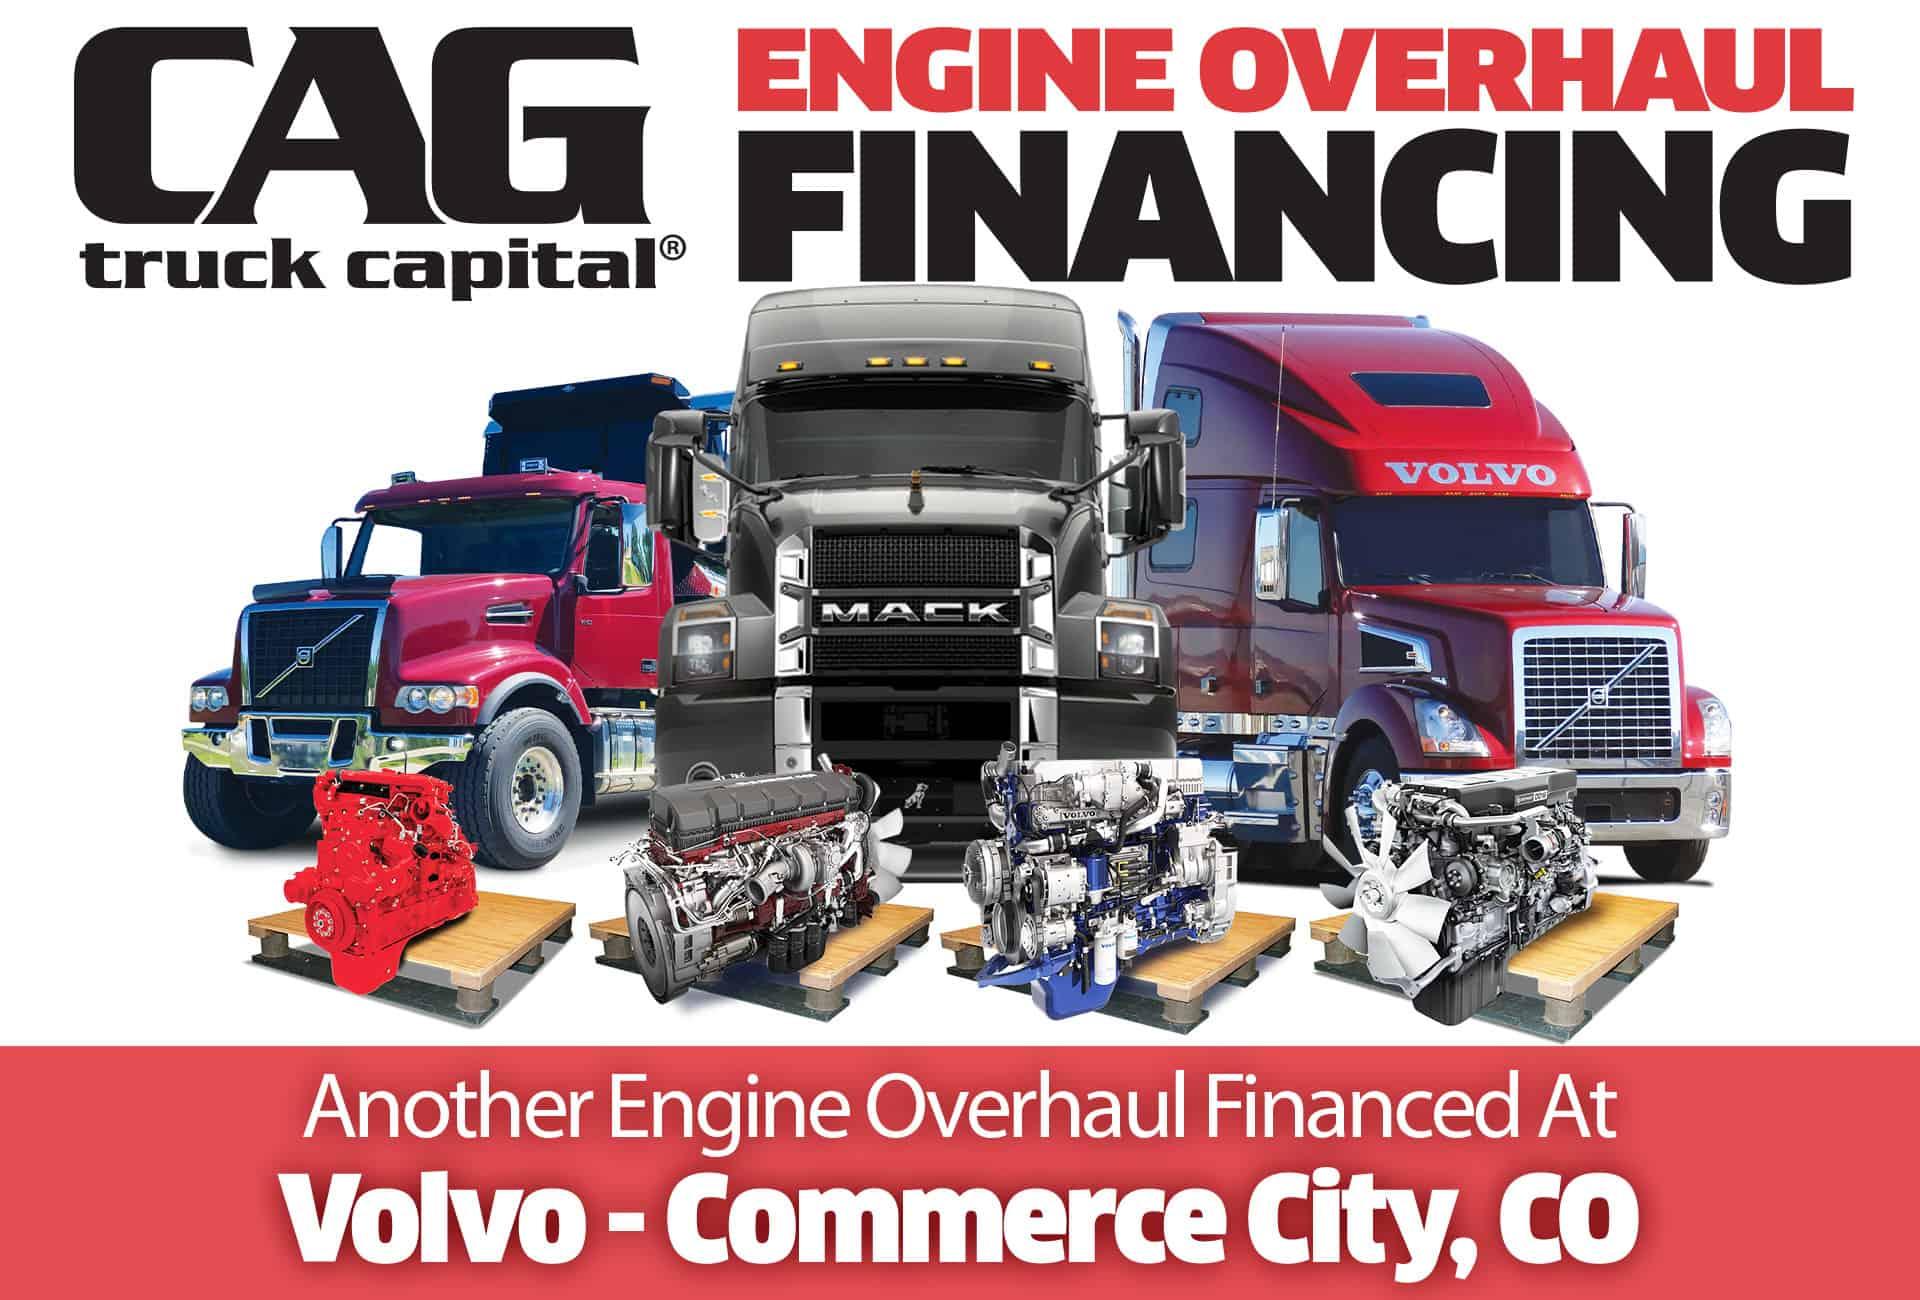 Volvo Engine Overhauls In North Platte, NE